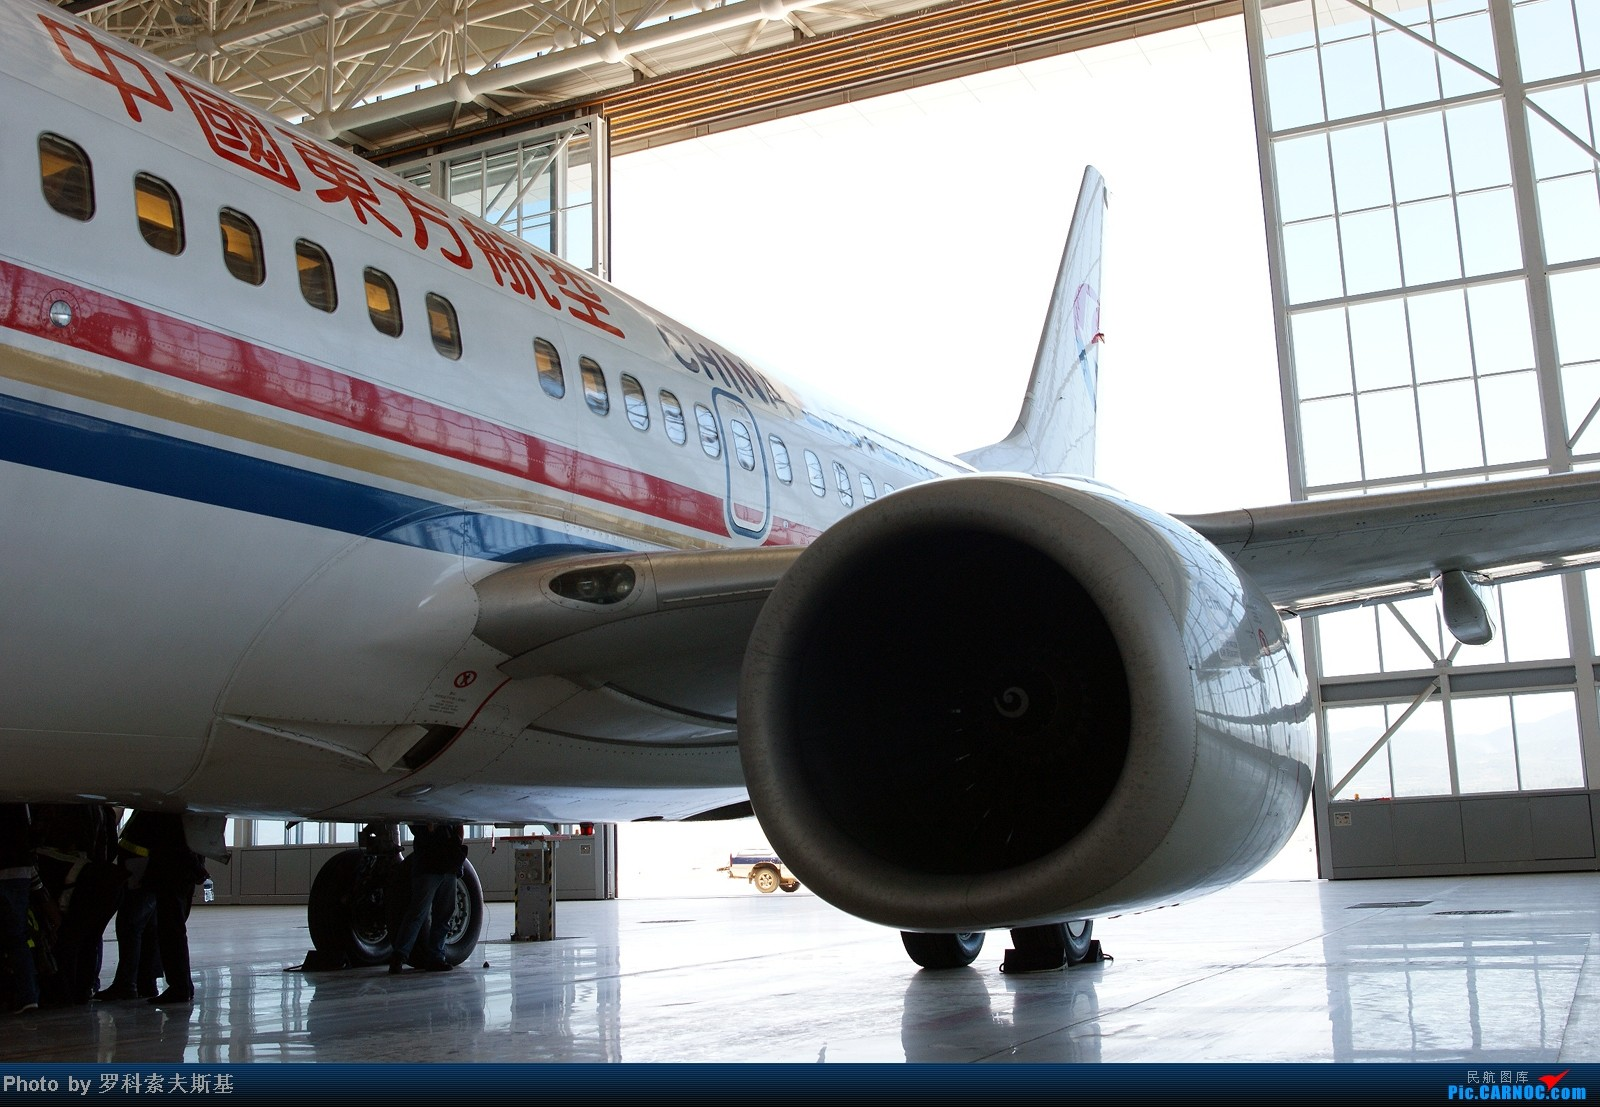 Re:[原创]]【昆明的天空】--东航机务带我游机库,交作业——请拐爷、老谷、蝎子、哲子各位批改! BOEING 737-700 B-5242 中国昆明长水机场